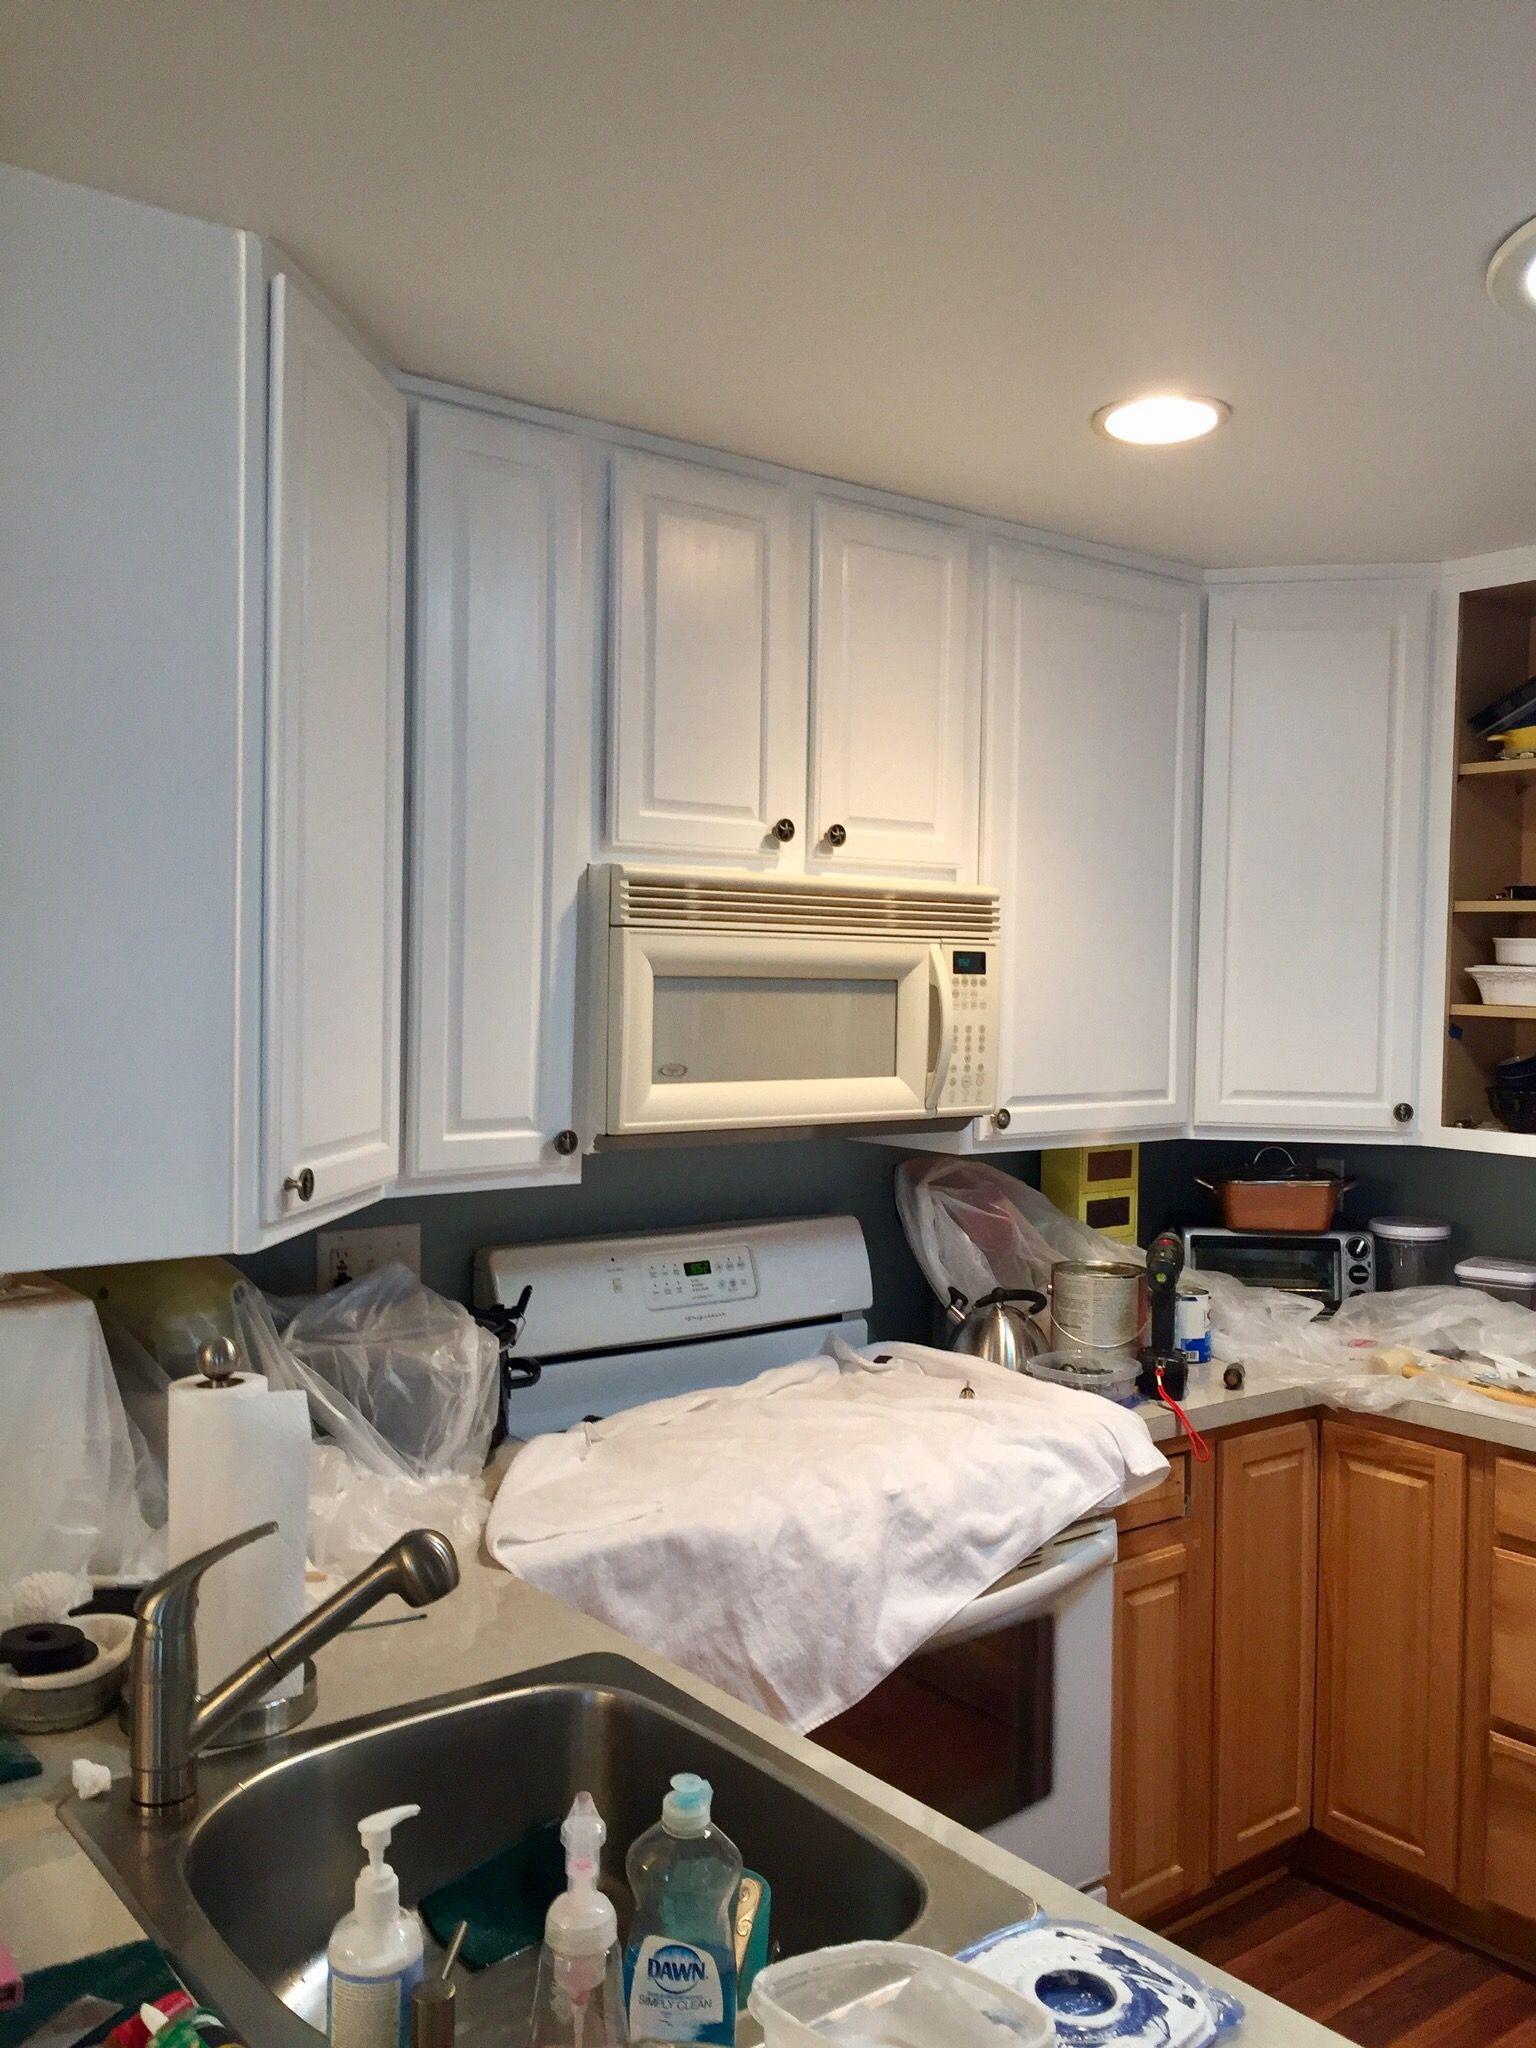 General Finishes Qd Milk Paint 1 Quart Driftwood Amazon Com Milk Paint Kitchen Cabinets Kitchen Paint Painting Kitchen Cabinets